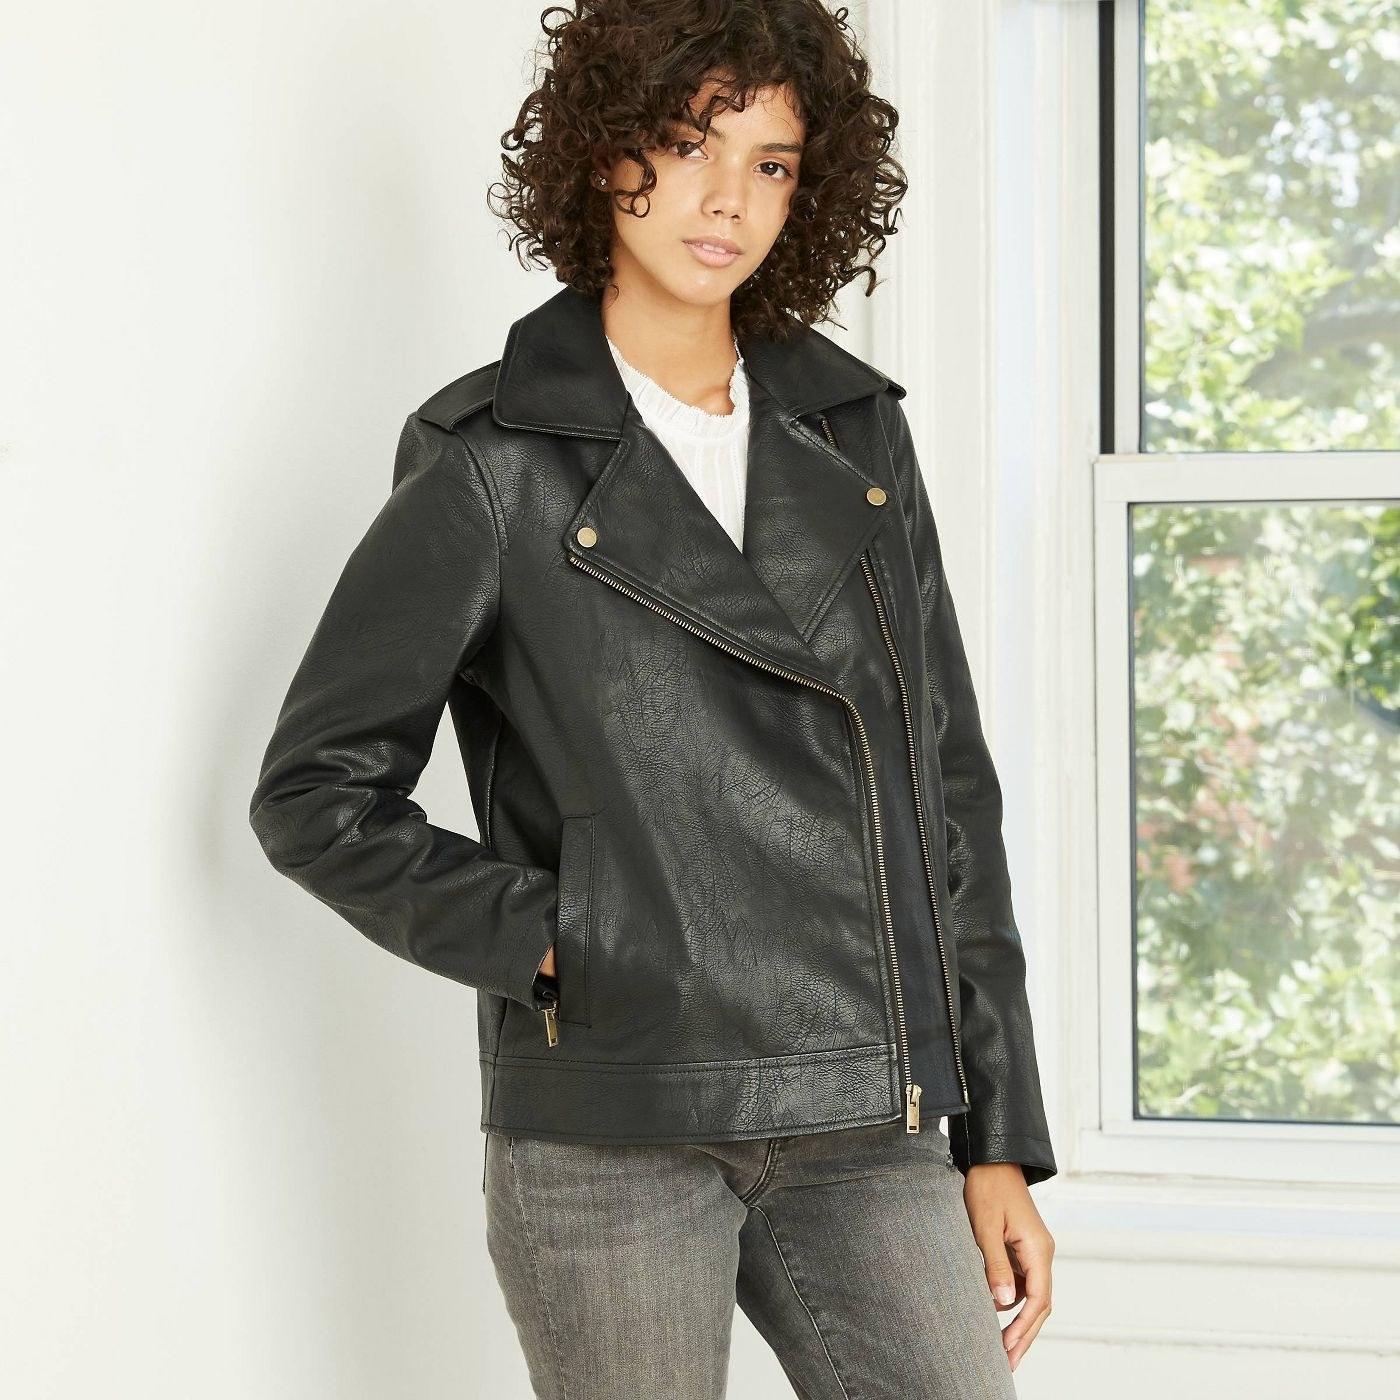 Model wearing black moto jacket